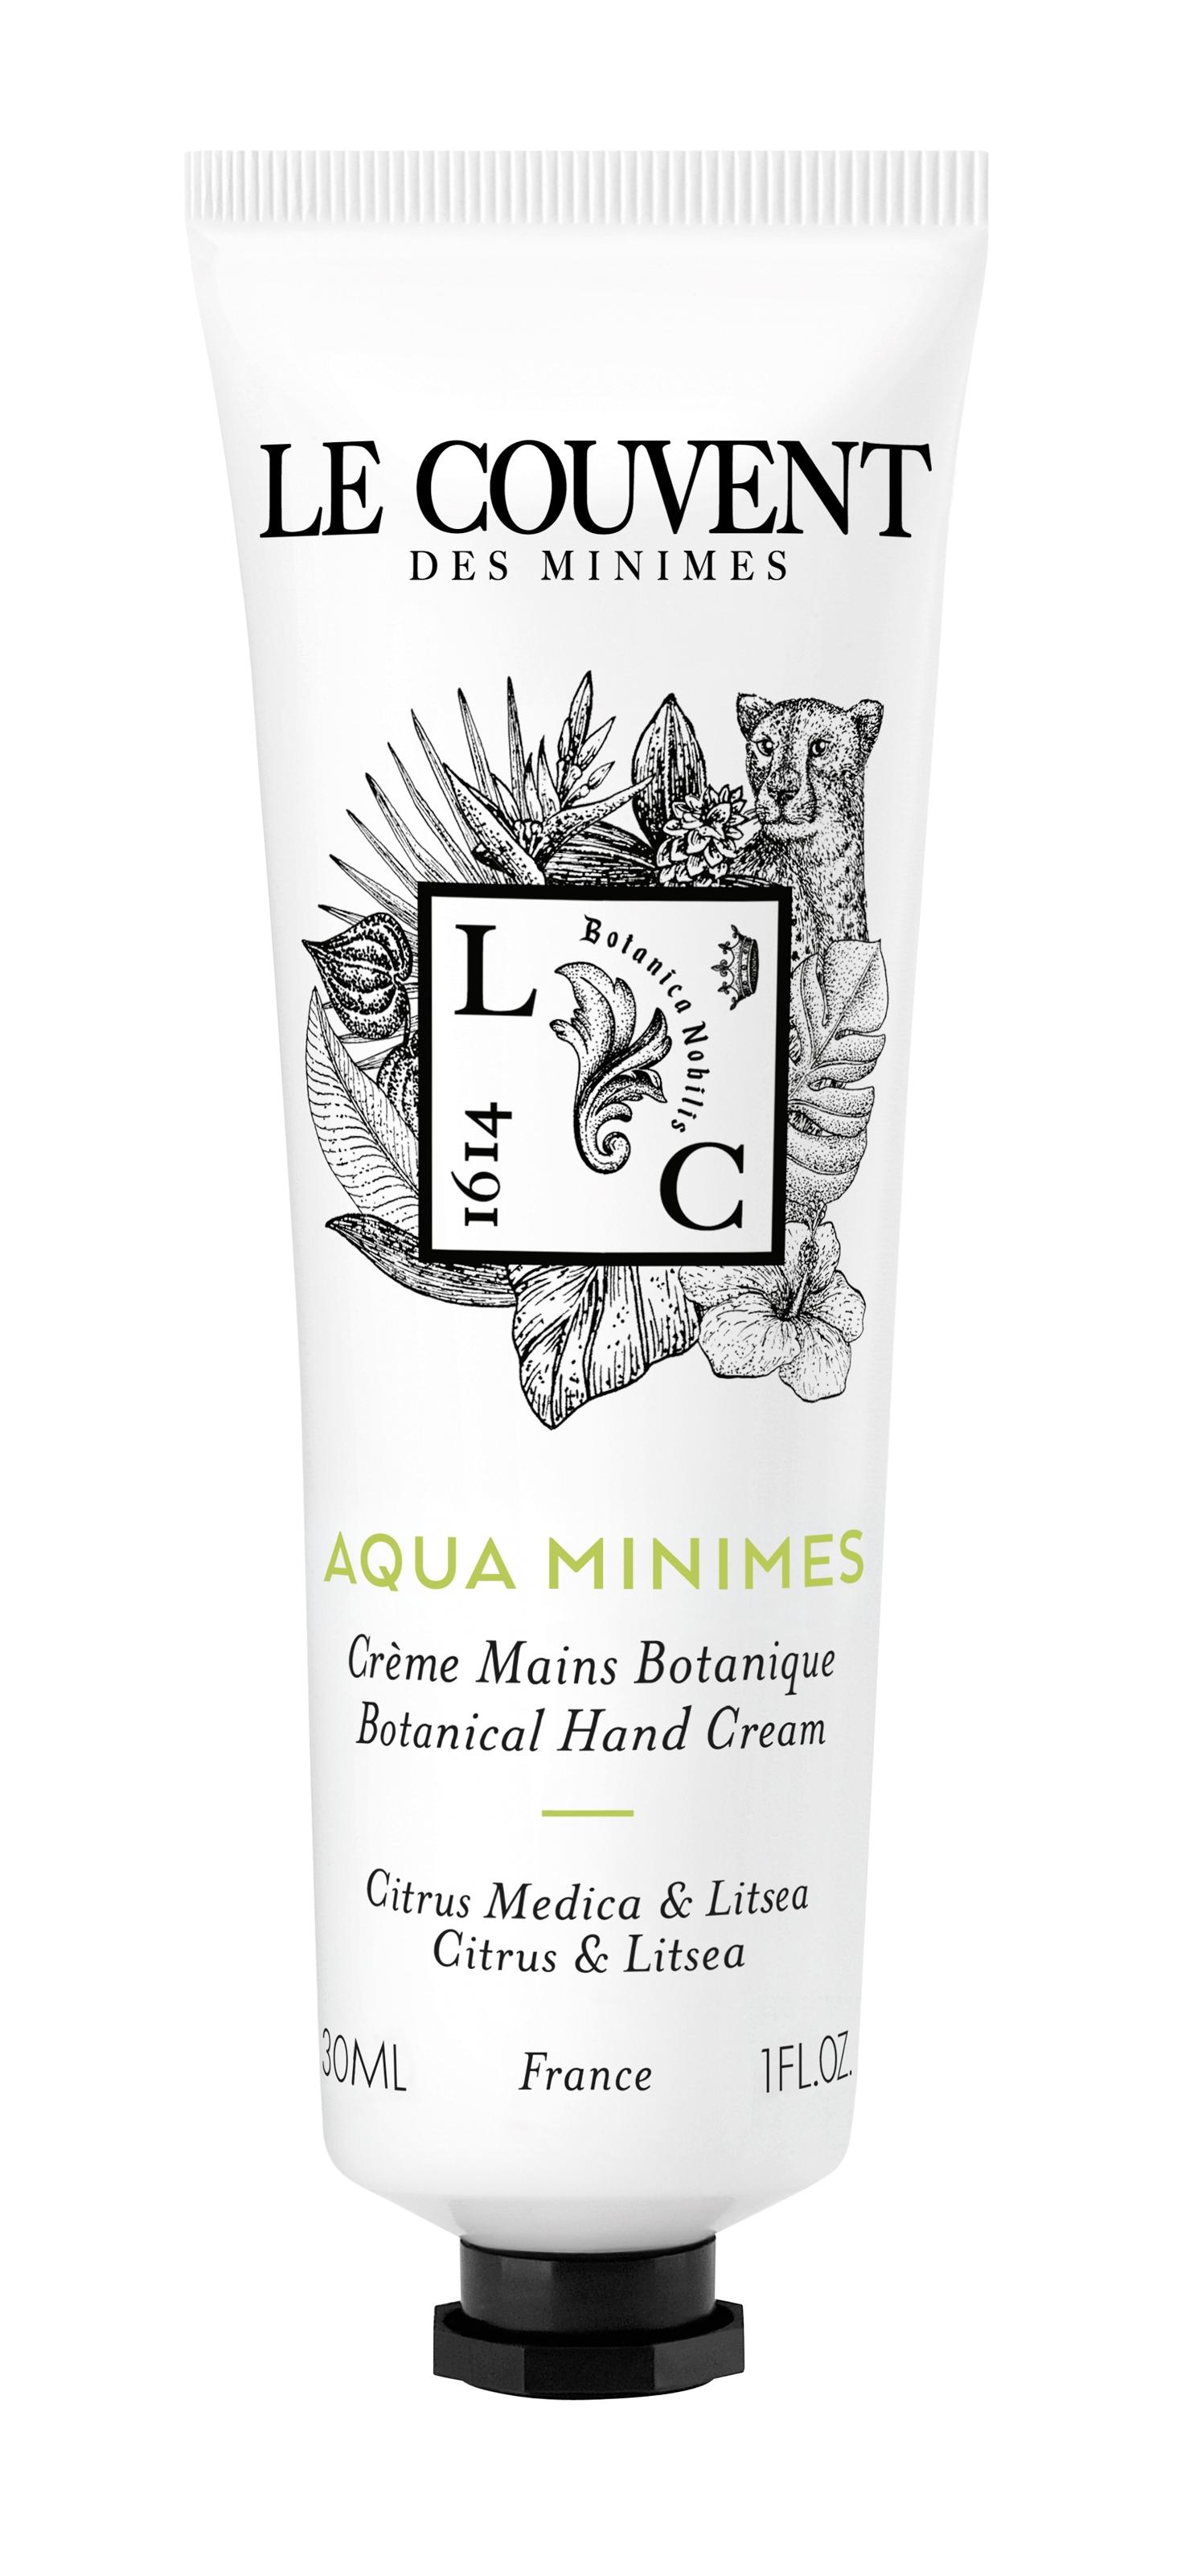 Botanical Aqua Minimes Hand Creme 30ml